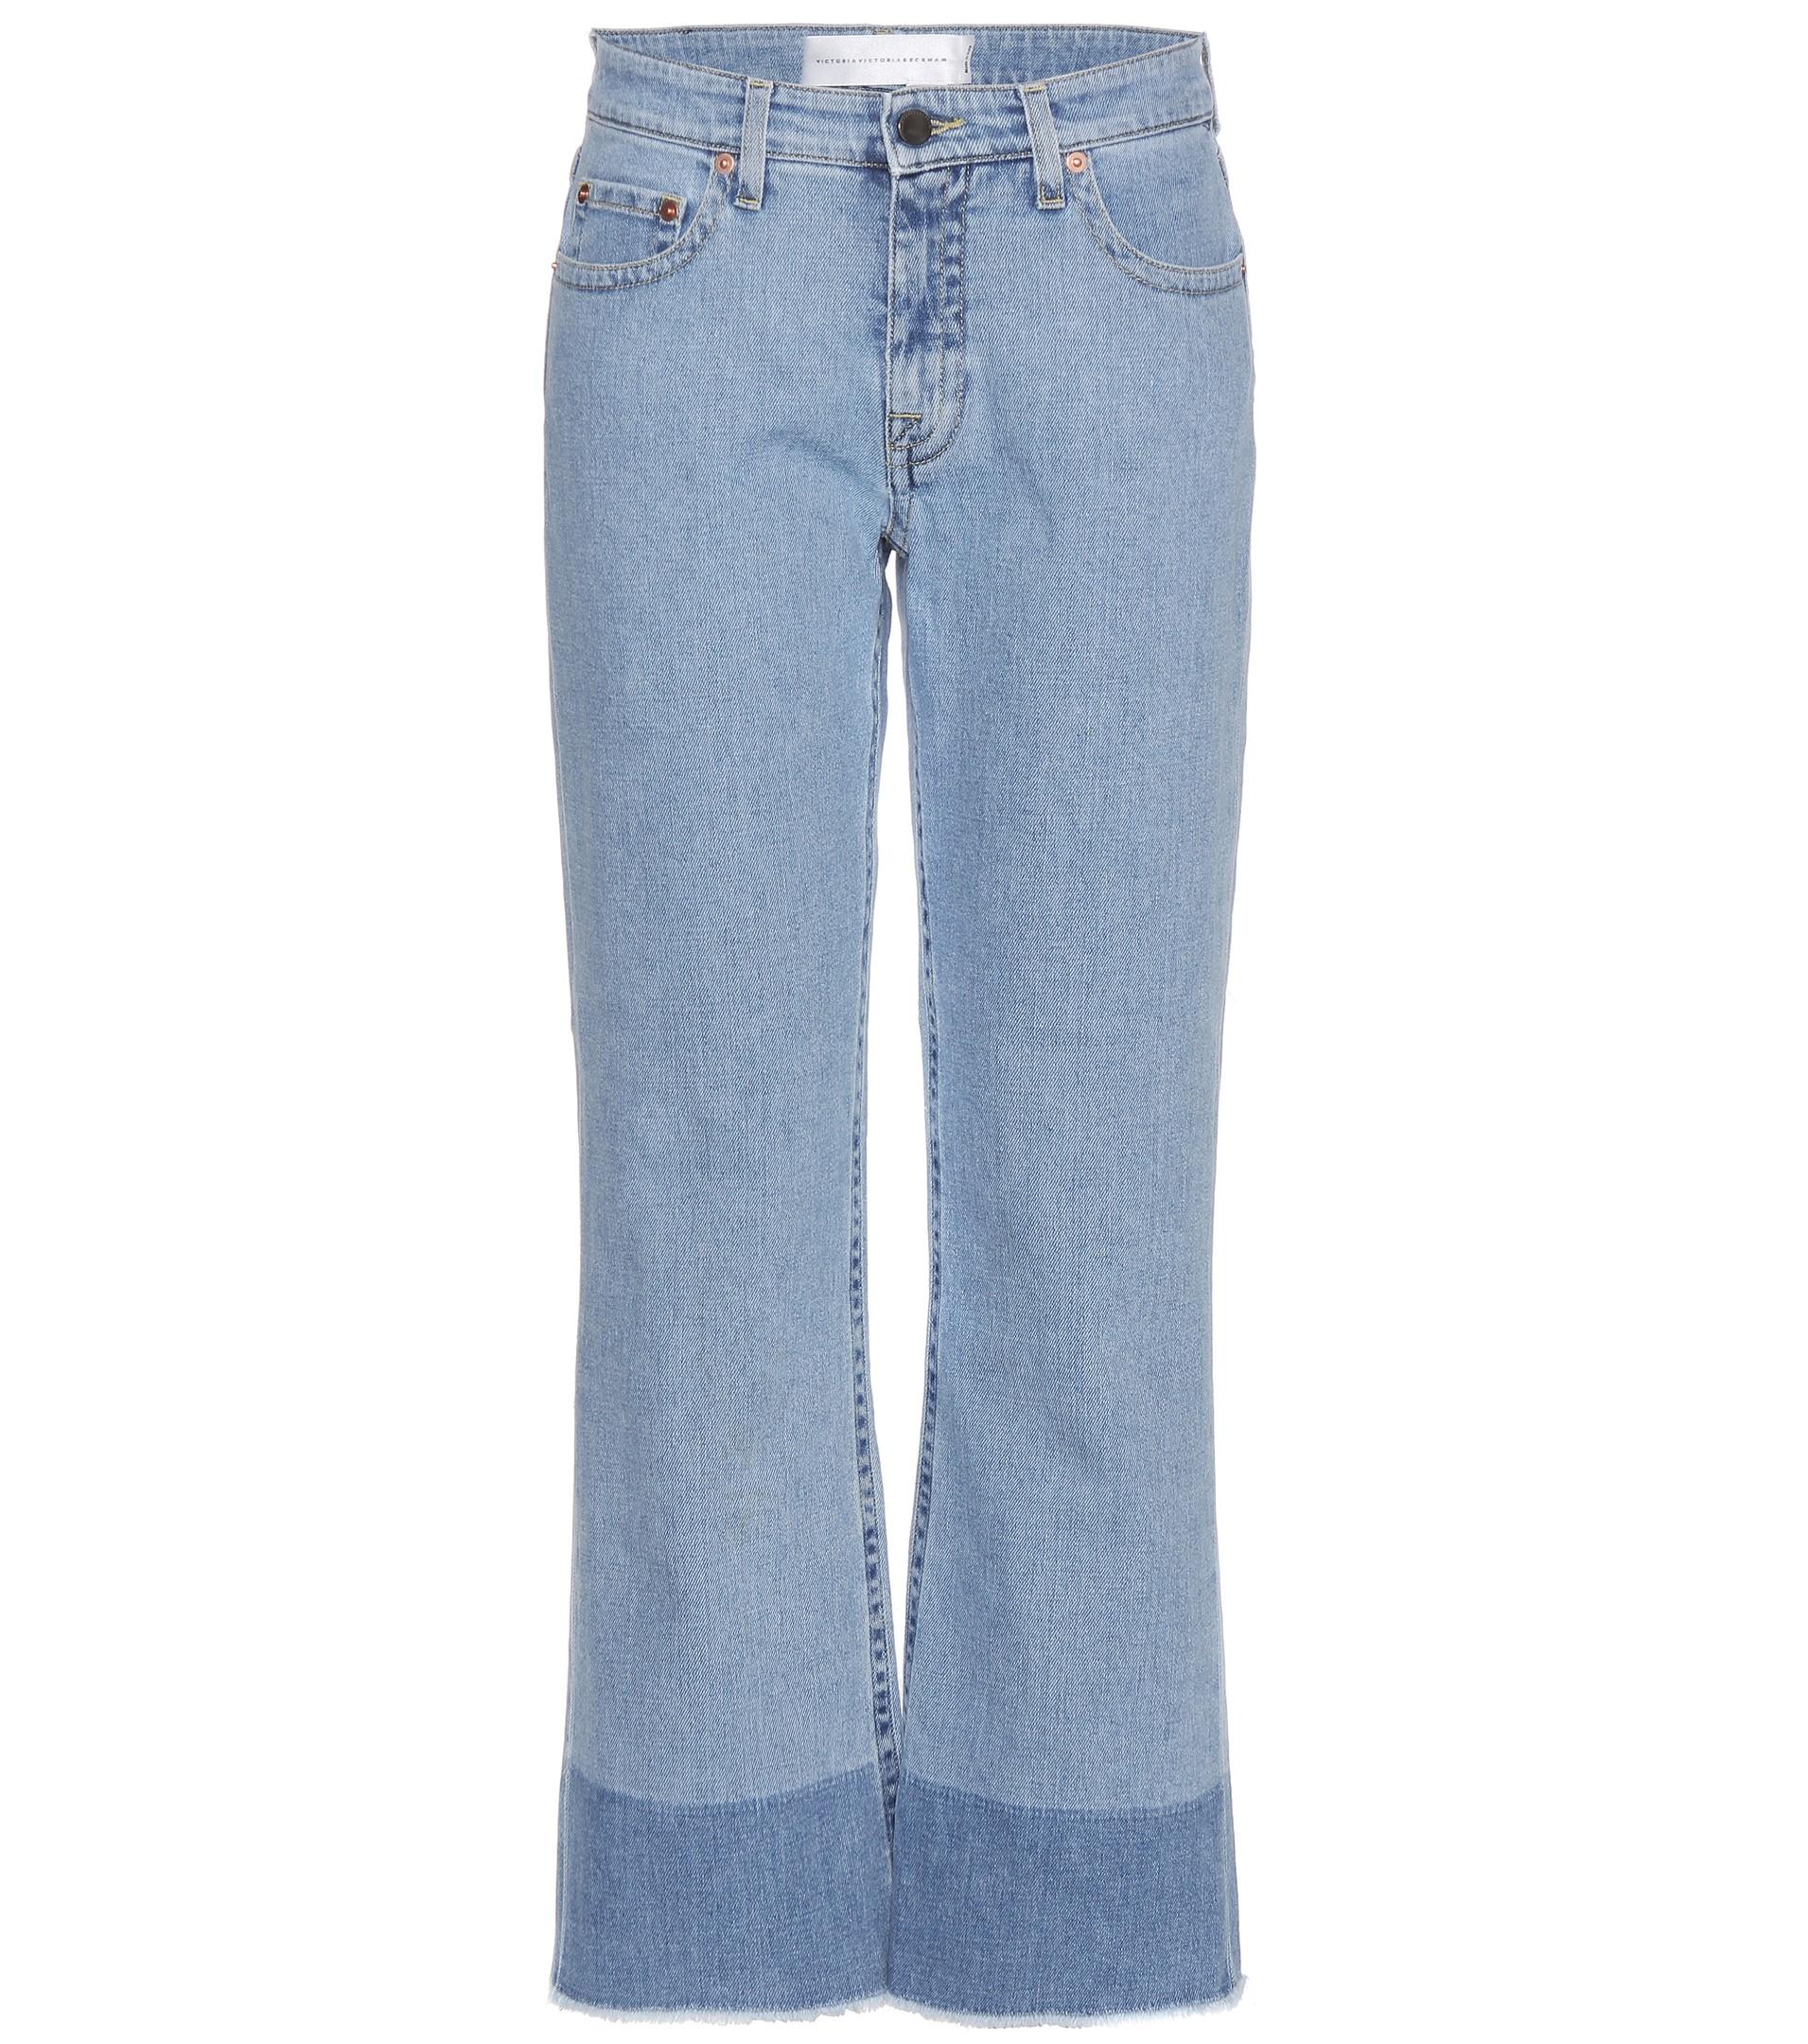 Victoria, Victoria Beckham Woman Faded Straight-leg Jeans Mid Denim Size 25 Victoria Beckham